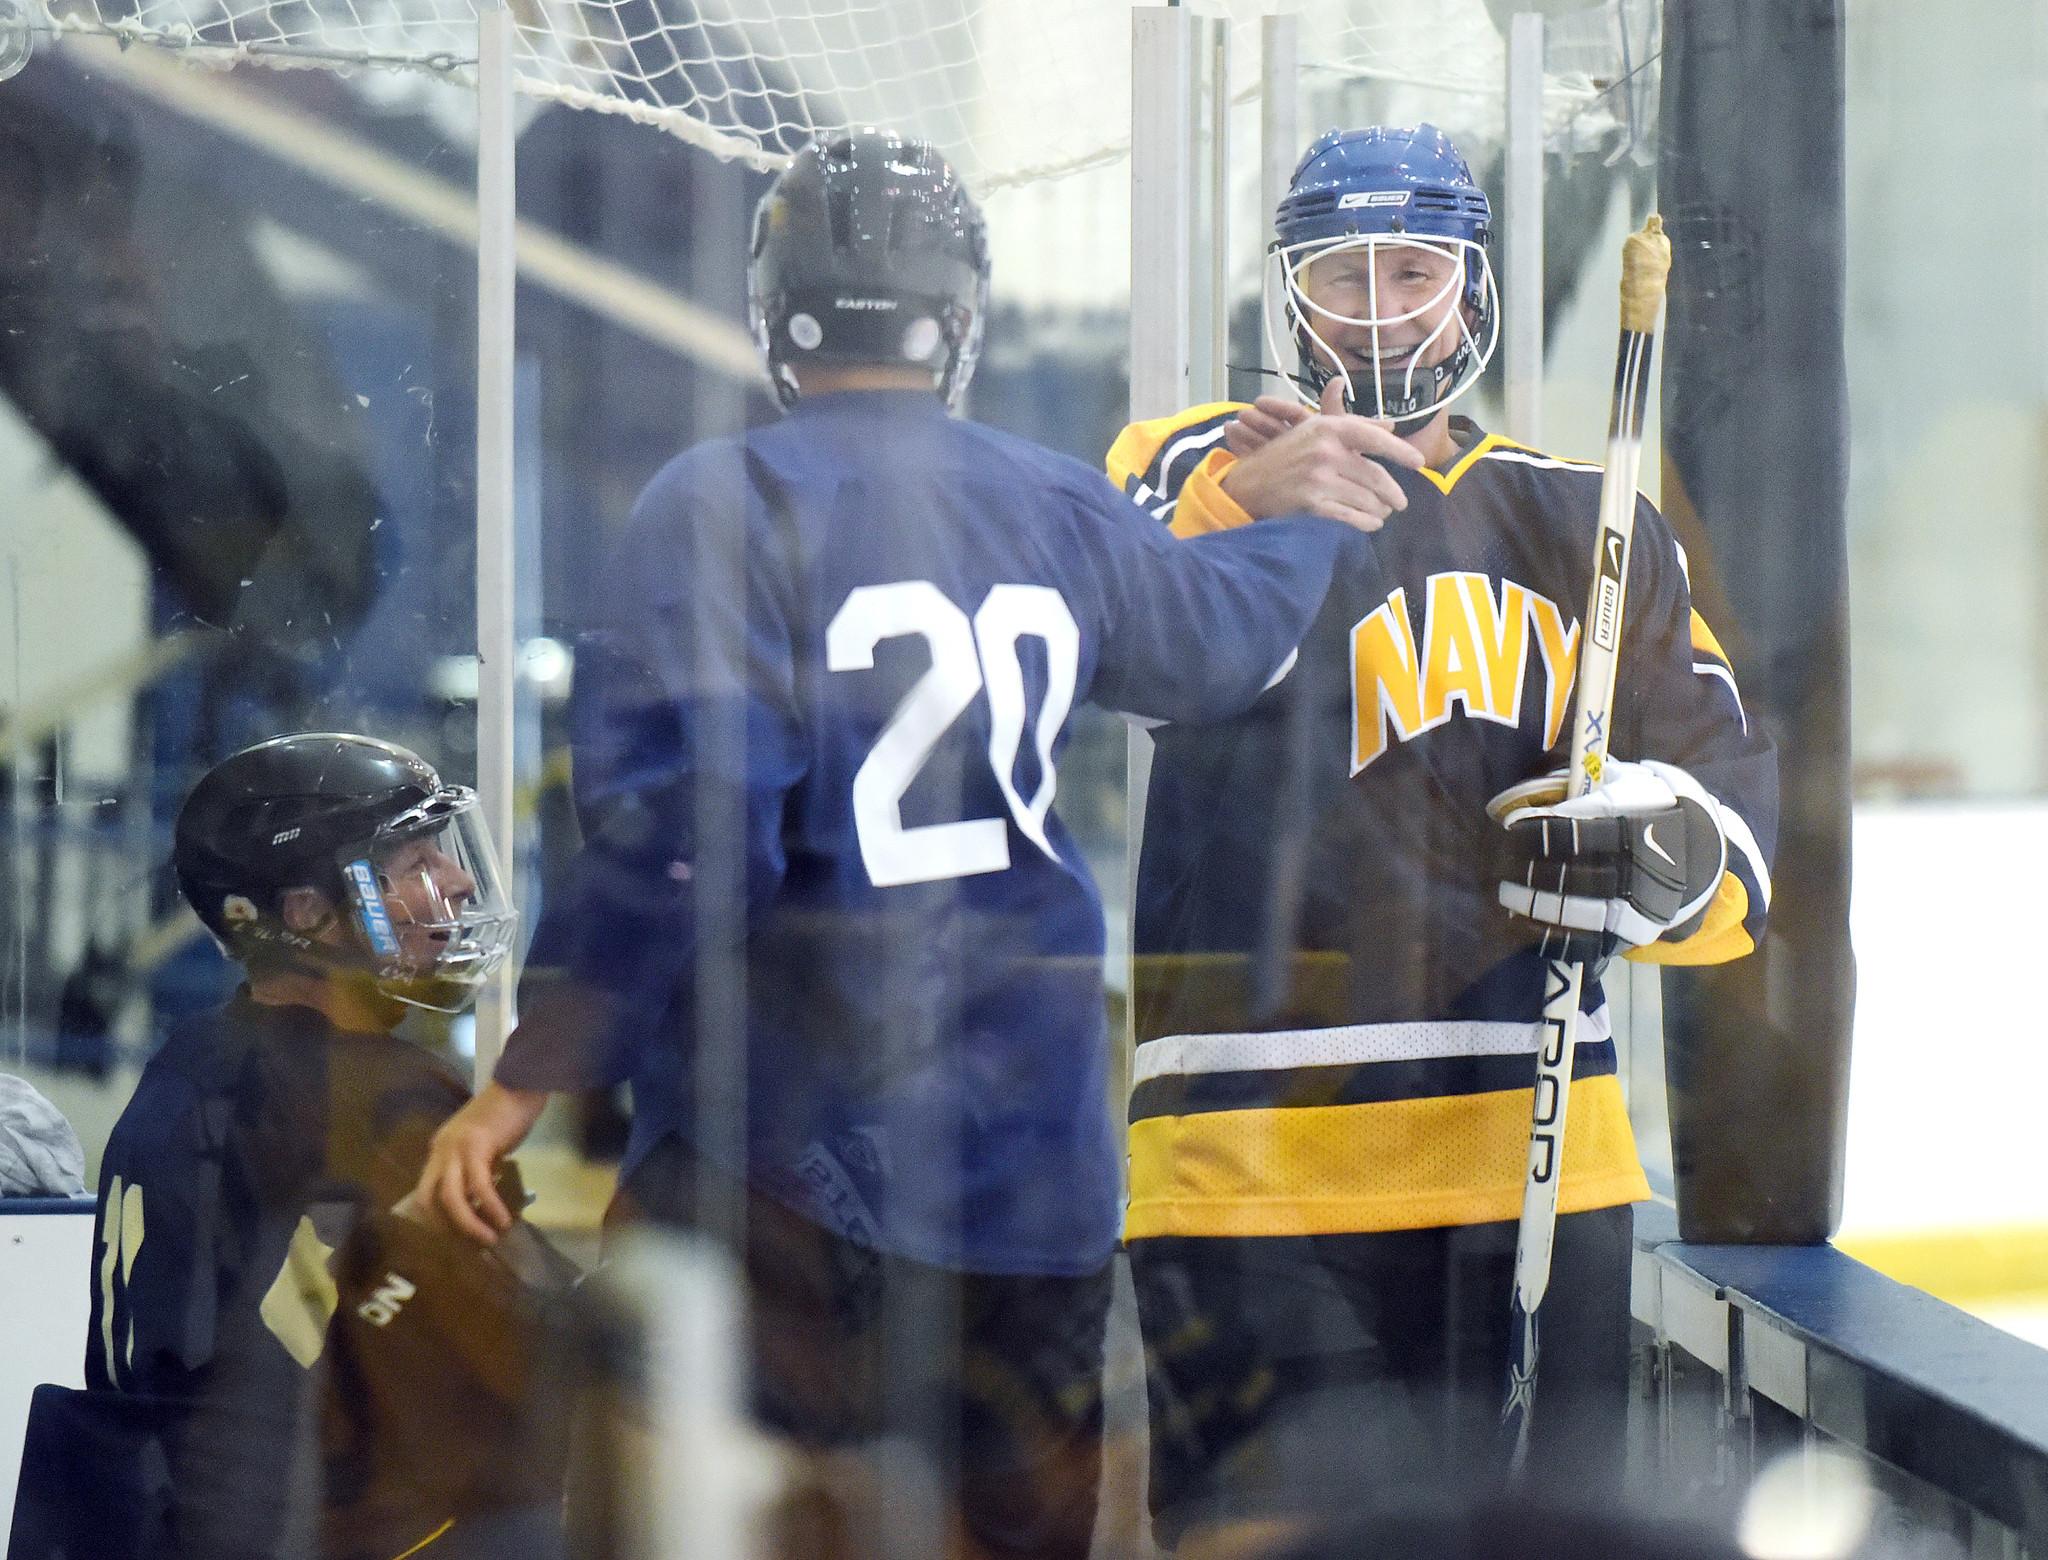 ae46dce6a71 Naval Academy Superintendent Carter plays ice hockey - Capital Gazette